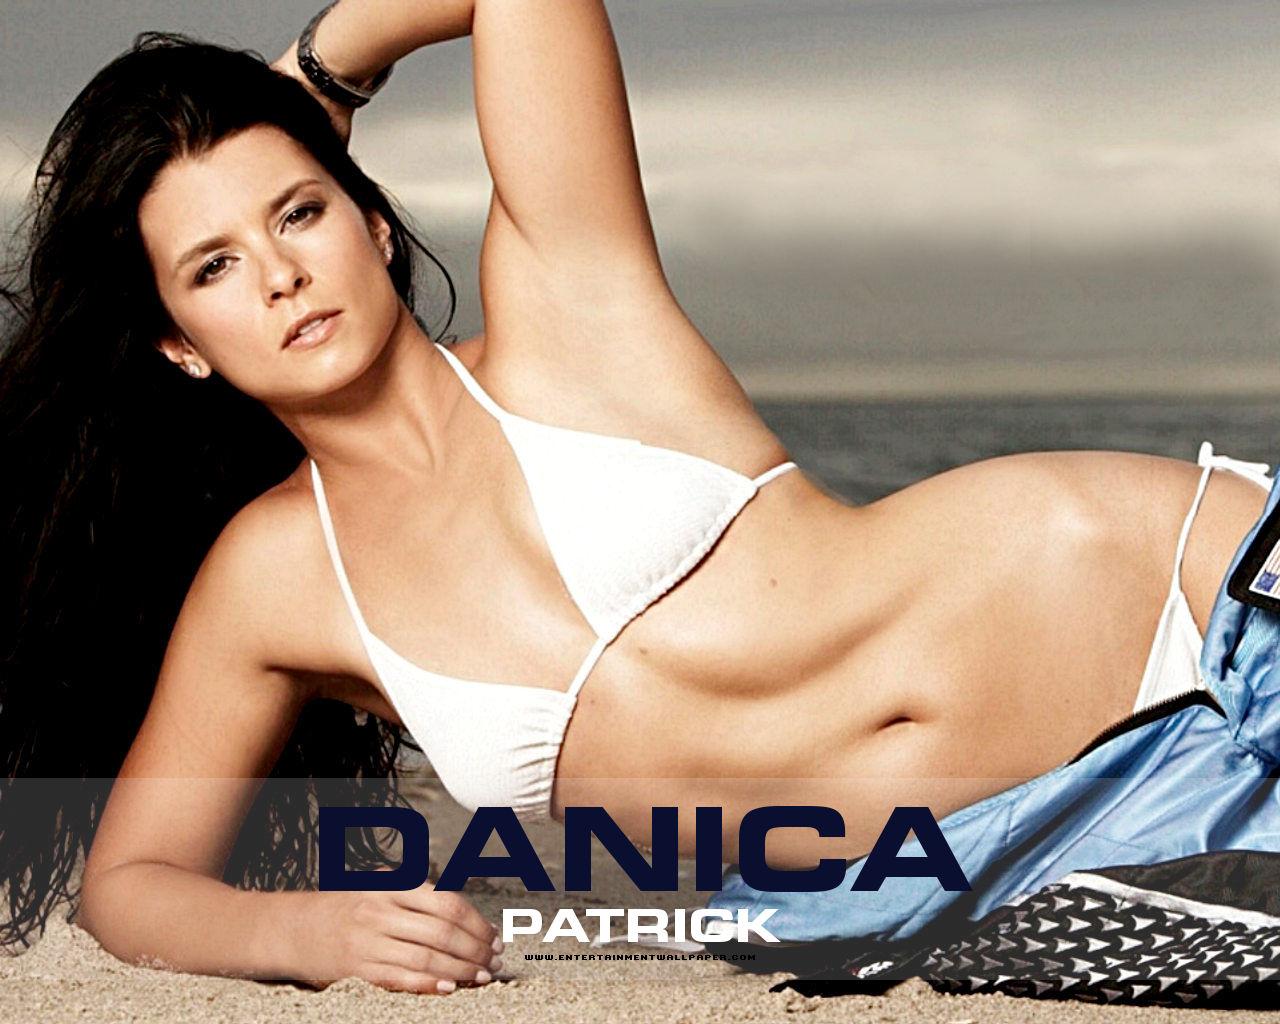 Sexy pics of danica patrick